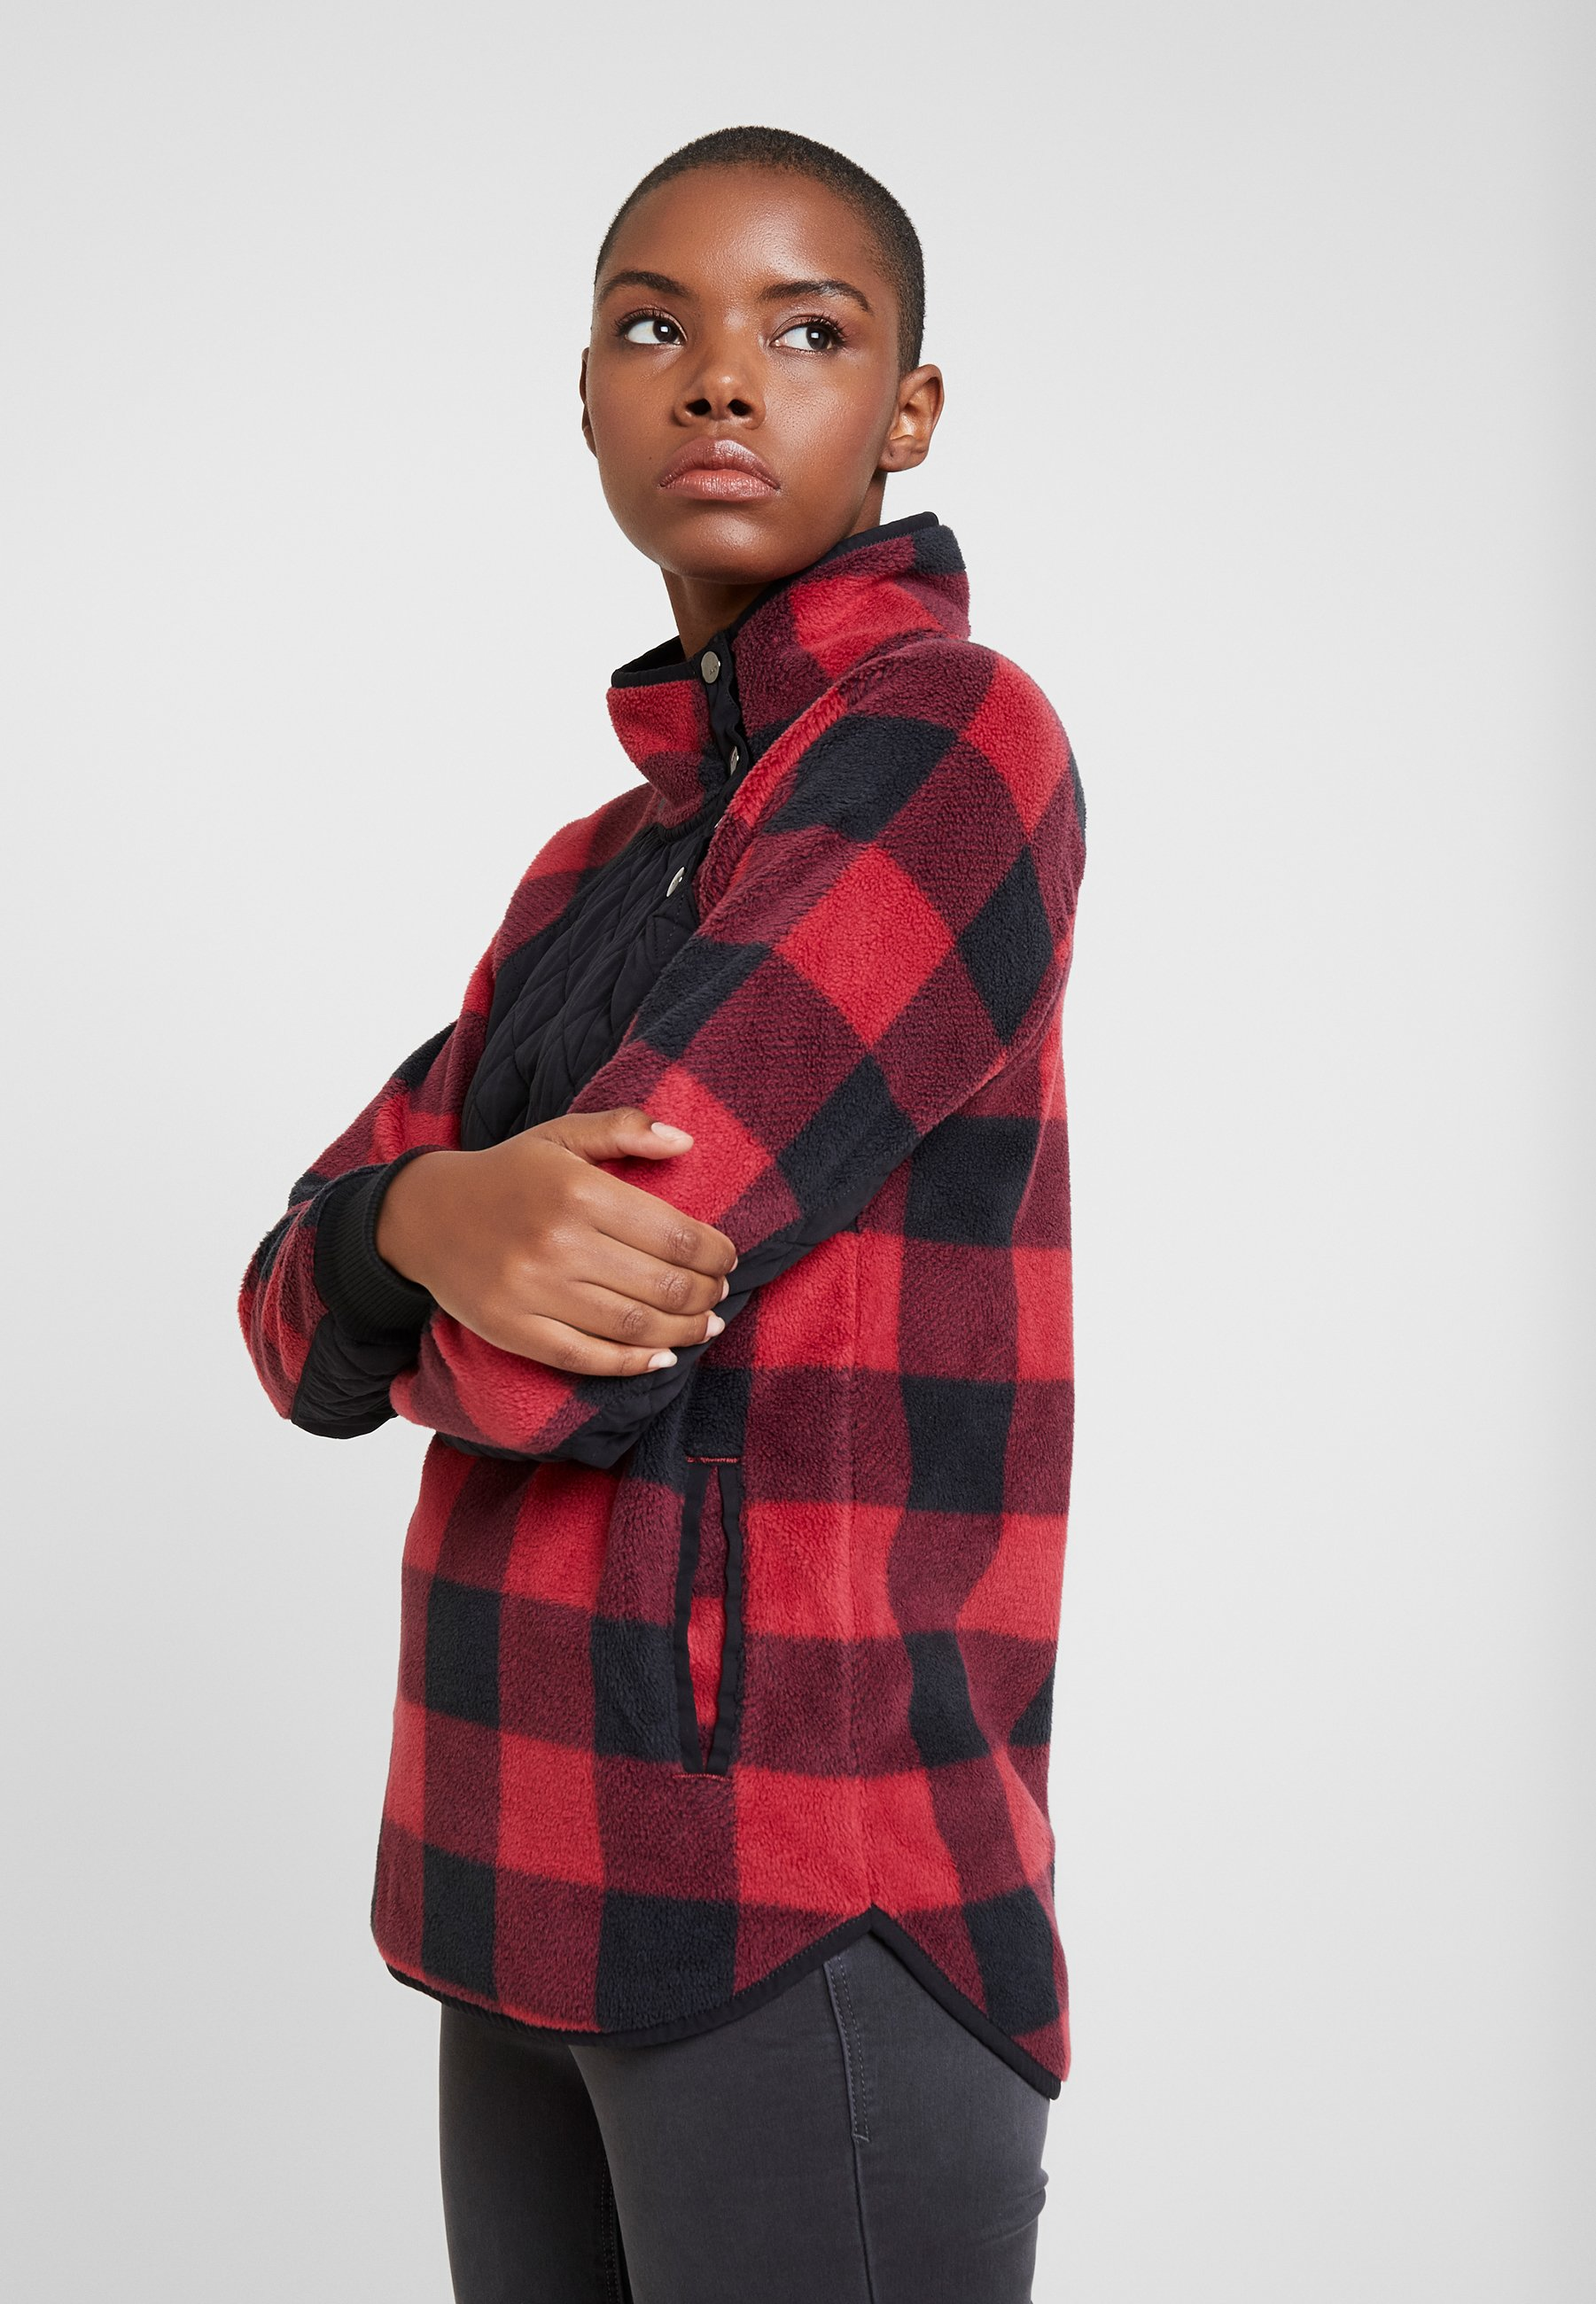 Abercrombieamp; Fitch Pattern Red SnapSweatshirt Asymetrical rxBCWedo